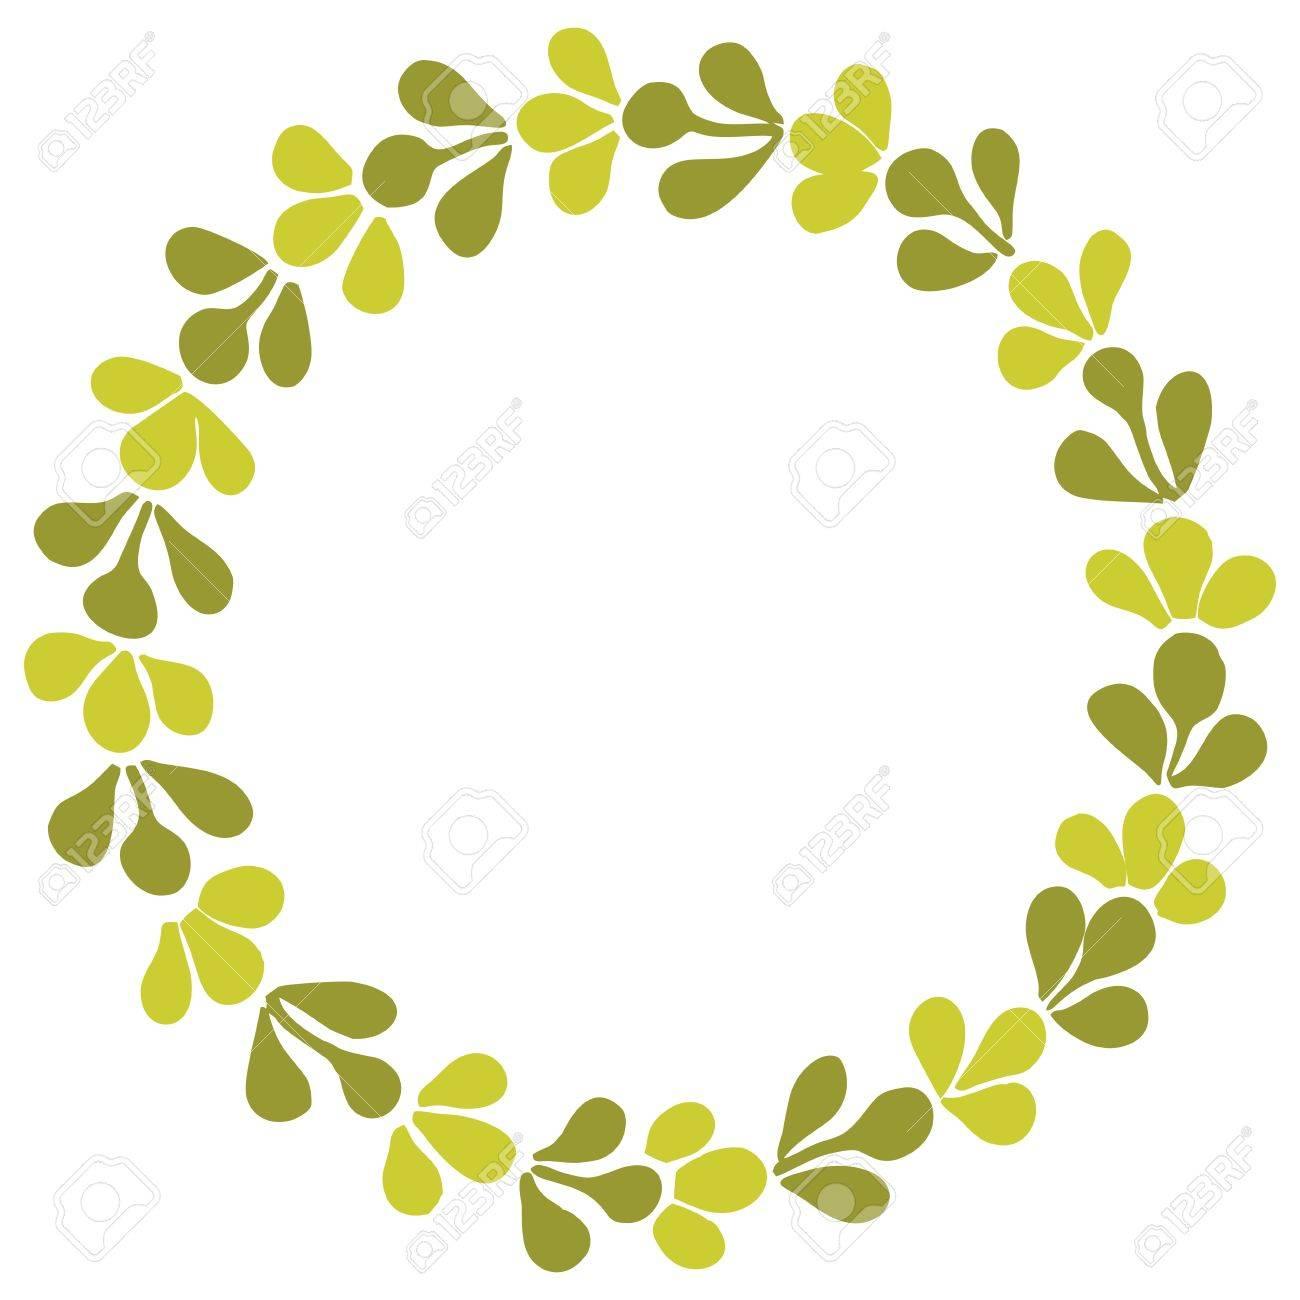 green laurel wreath vector frame isolated on white background rh 123rf com free vector frame download free vector frame set ornamental vintage decoration